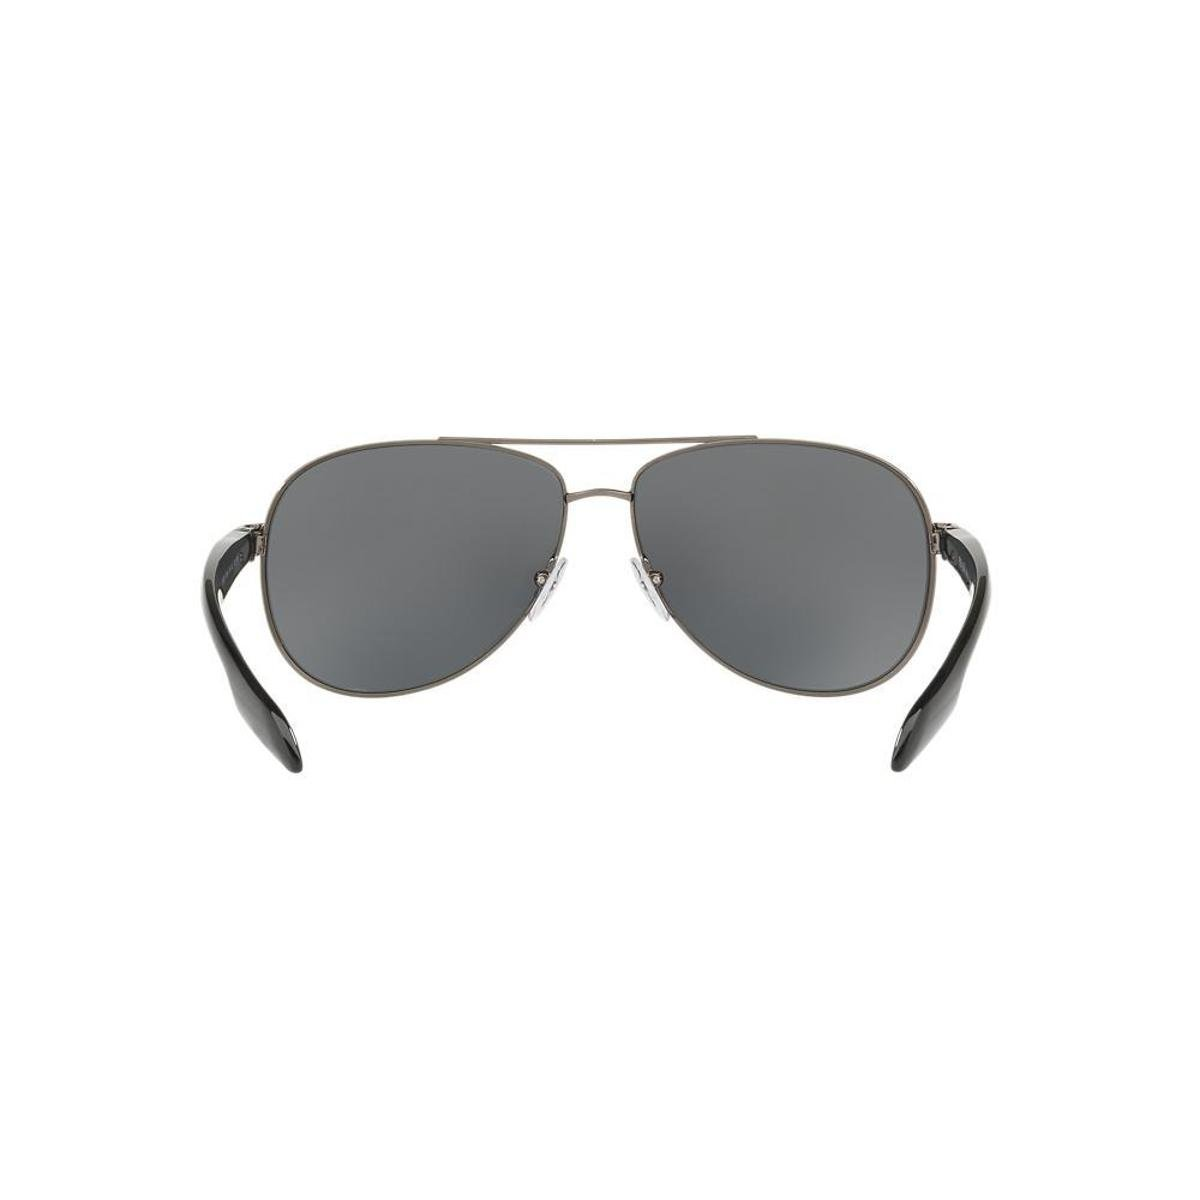 ... Óculos de Sol Prada Linea Rossa Piloto PS 53PS Benbow Masculino ... 48822d418e